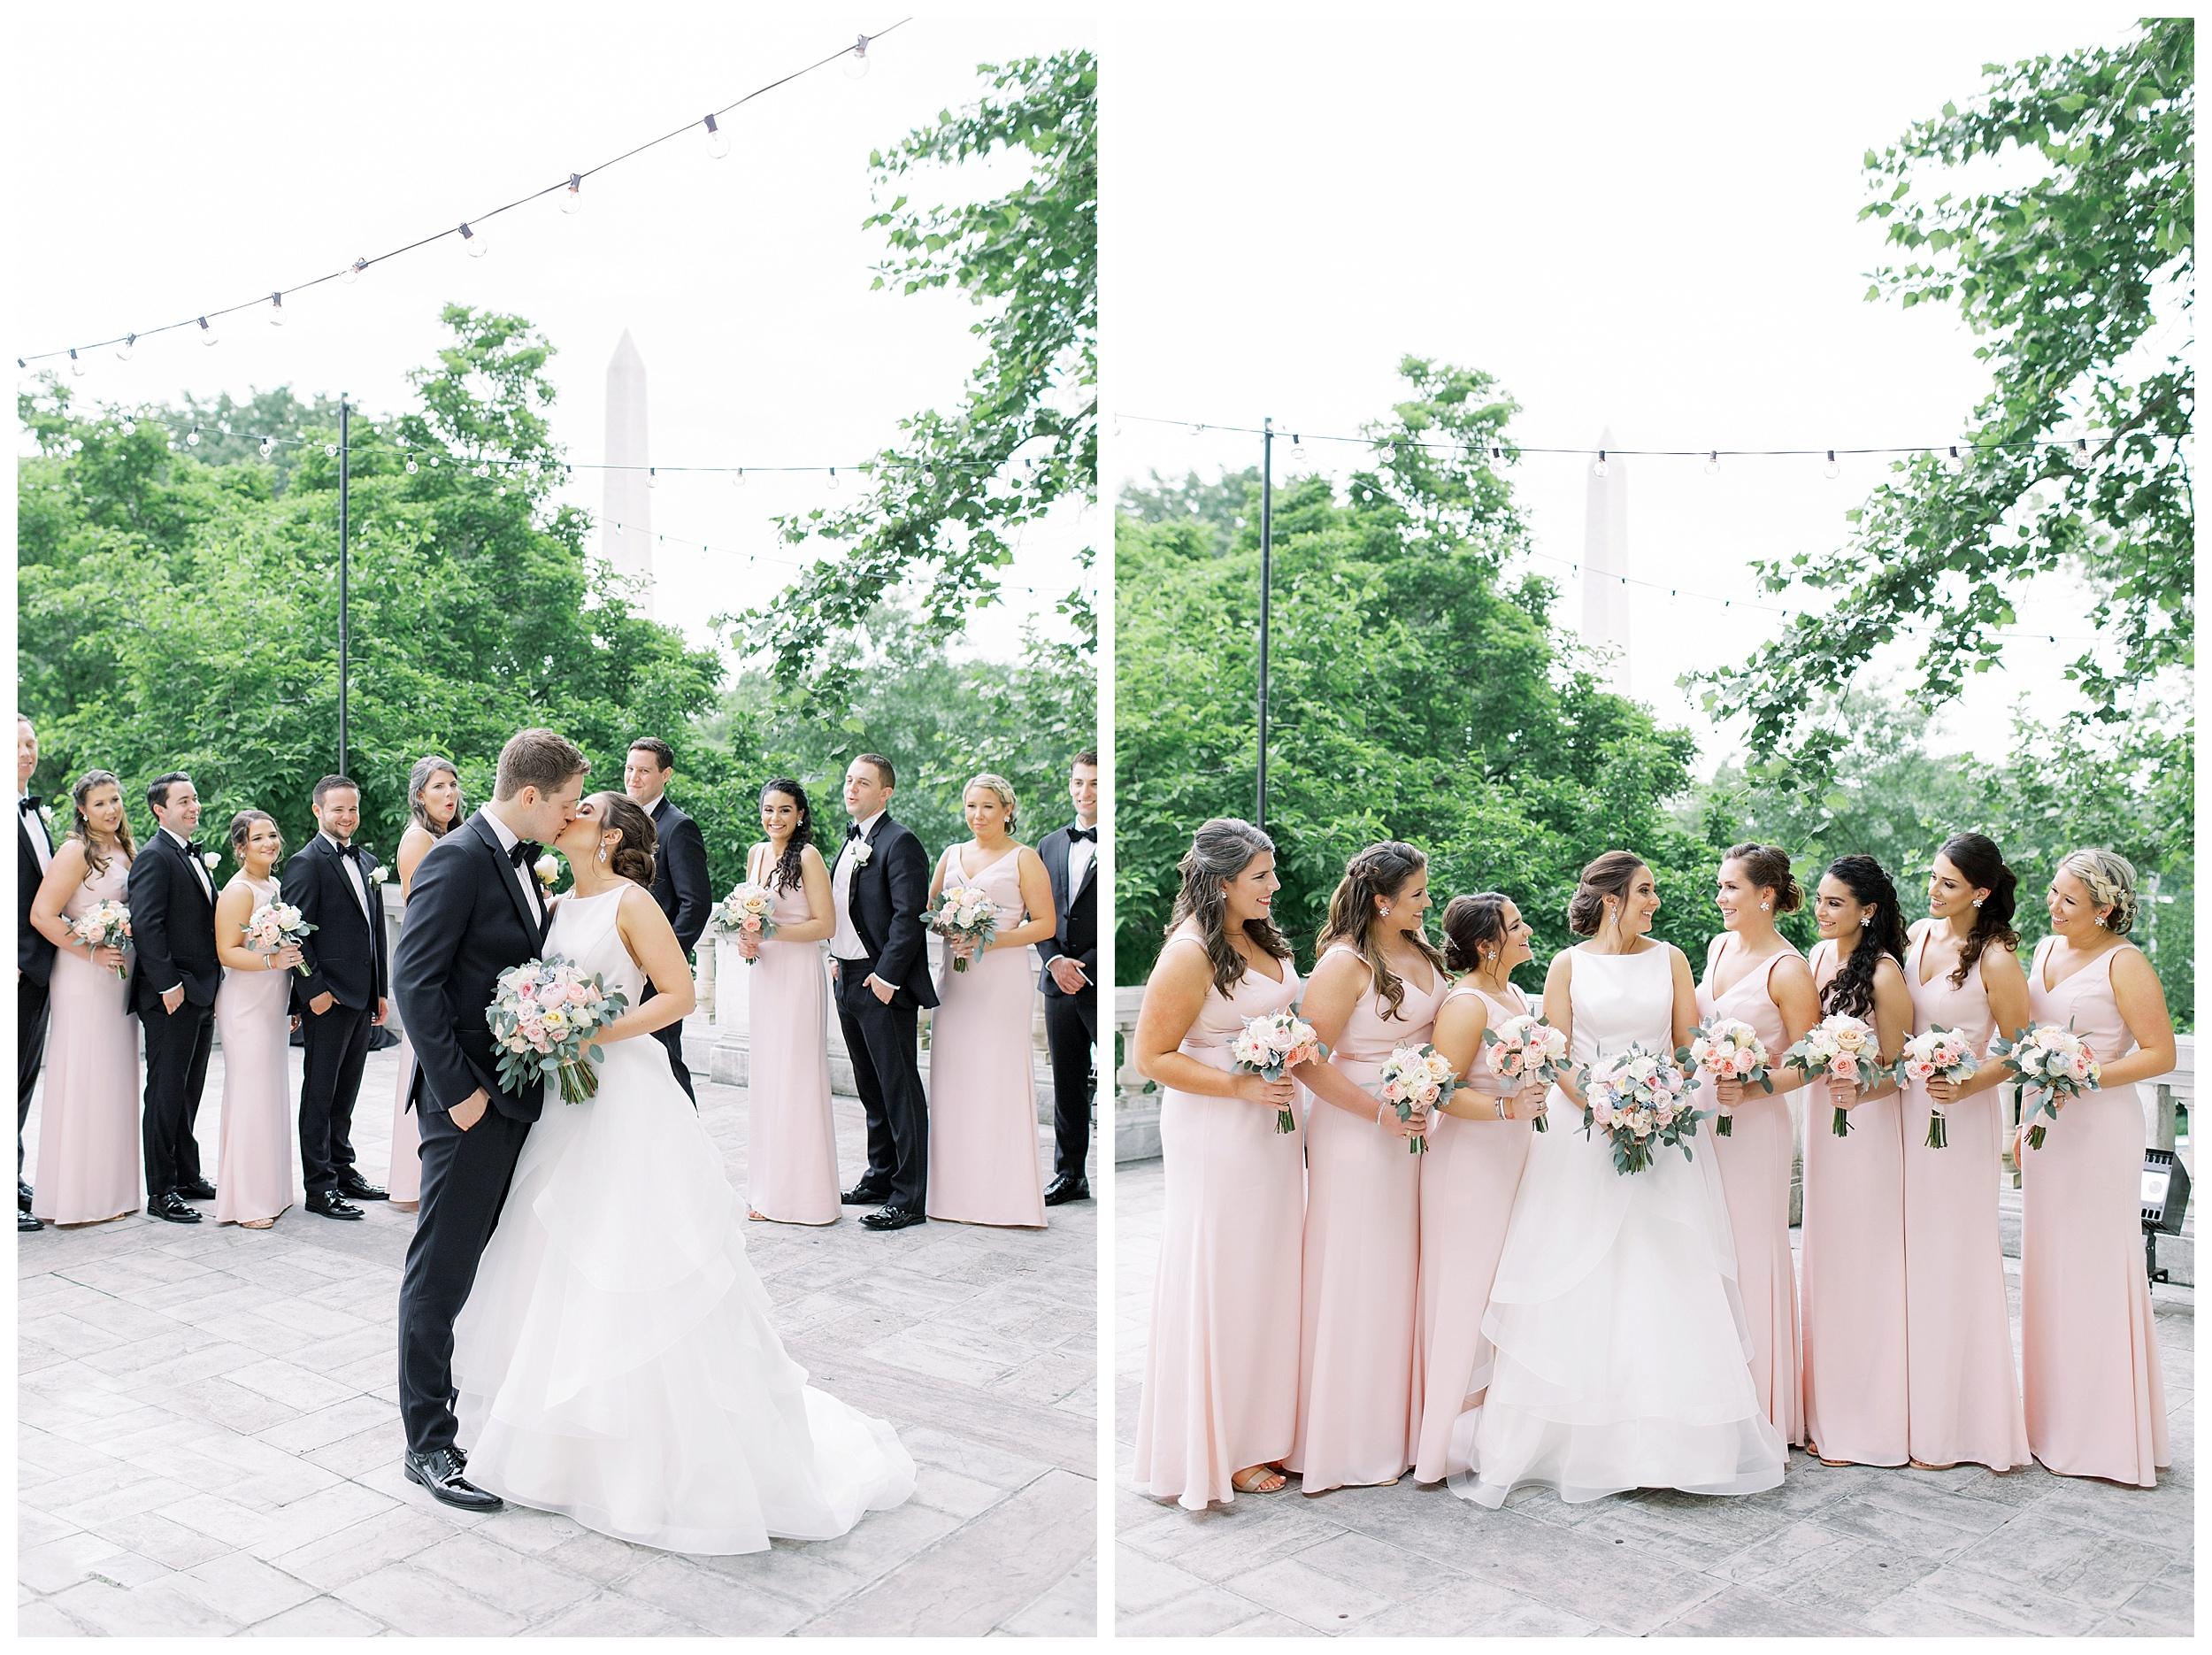 DAR Constitution Hall Wedding Wedding | Daughters of the American Revolution Wedding | District of Columbia Film Wedding Photographer Kir Tuben_0076.jpg